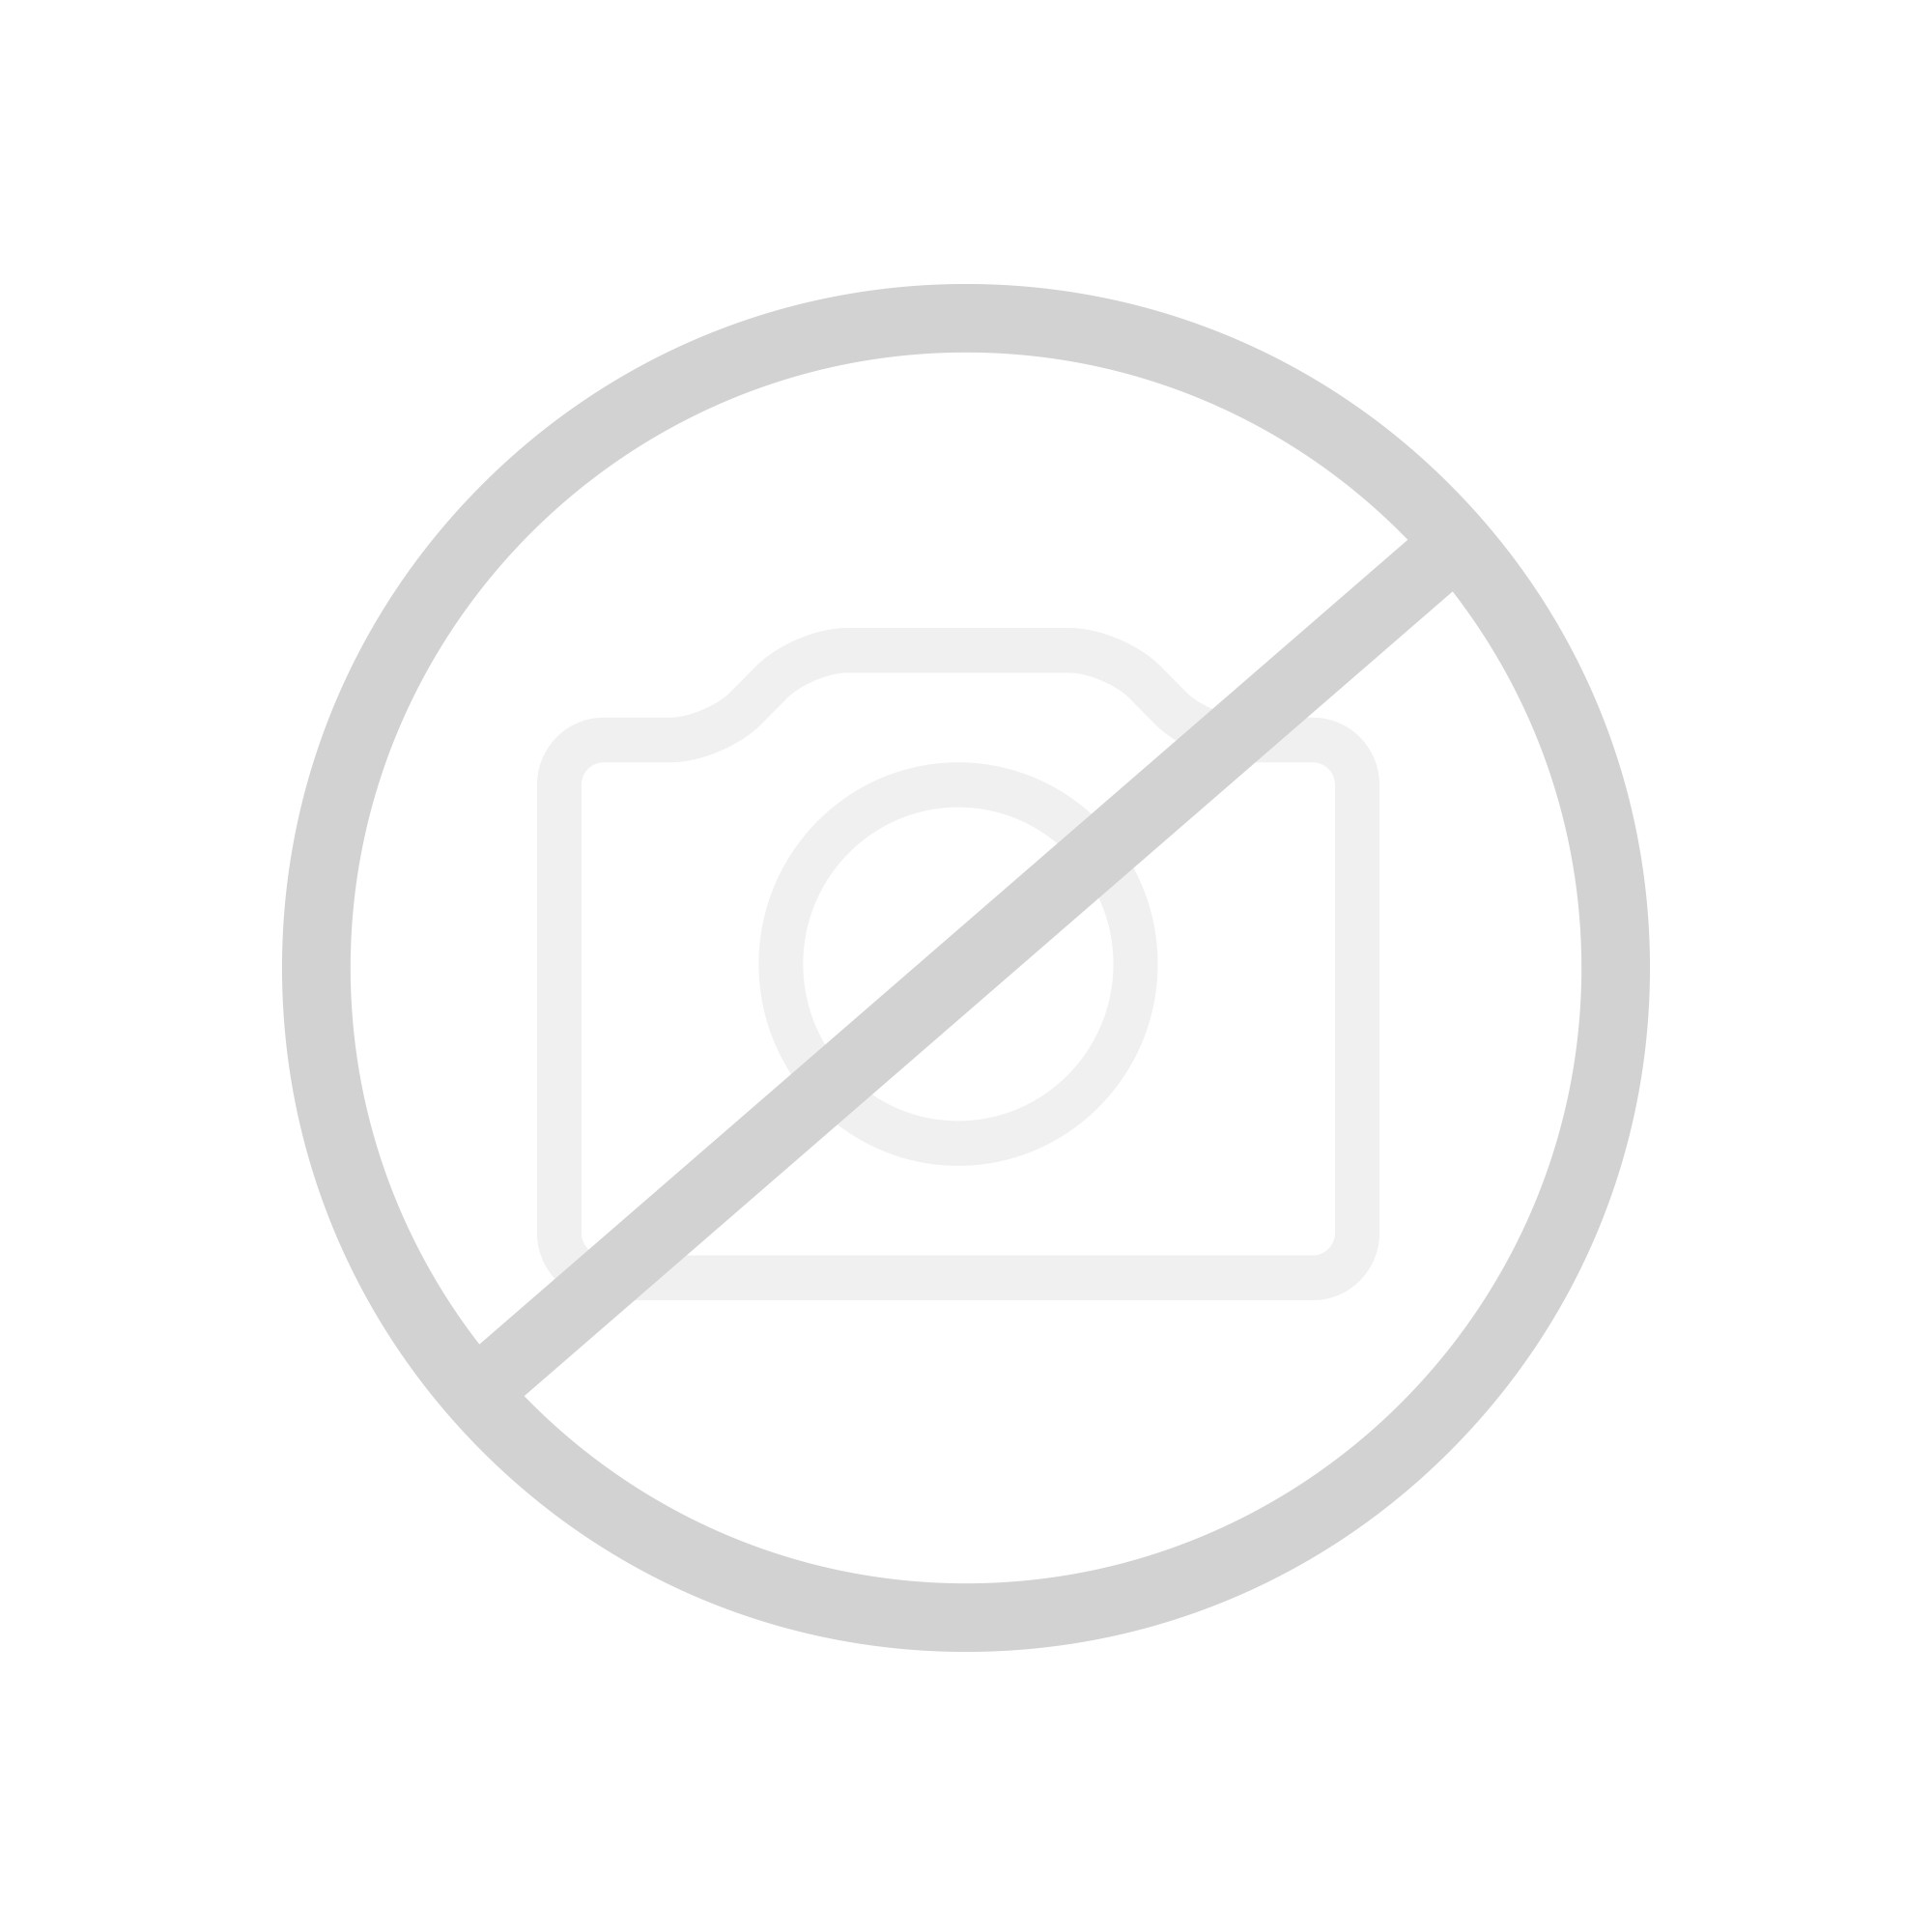 keuco edition 400 lotionspender wandmontage. Black Bedroom Furniture Sets. Home Design Ideas